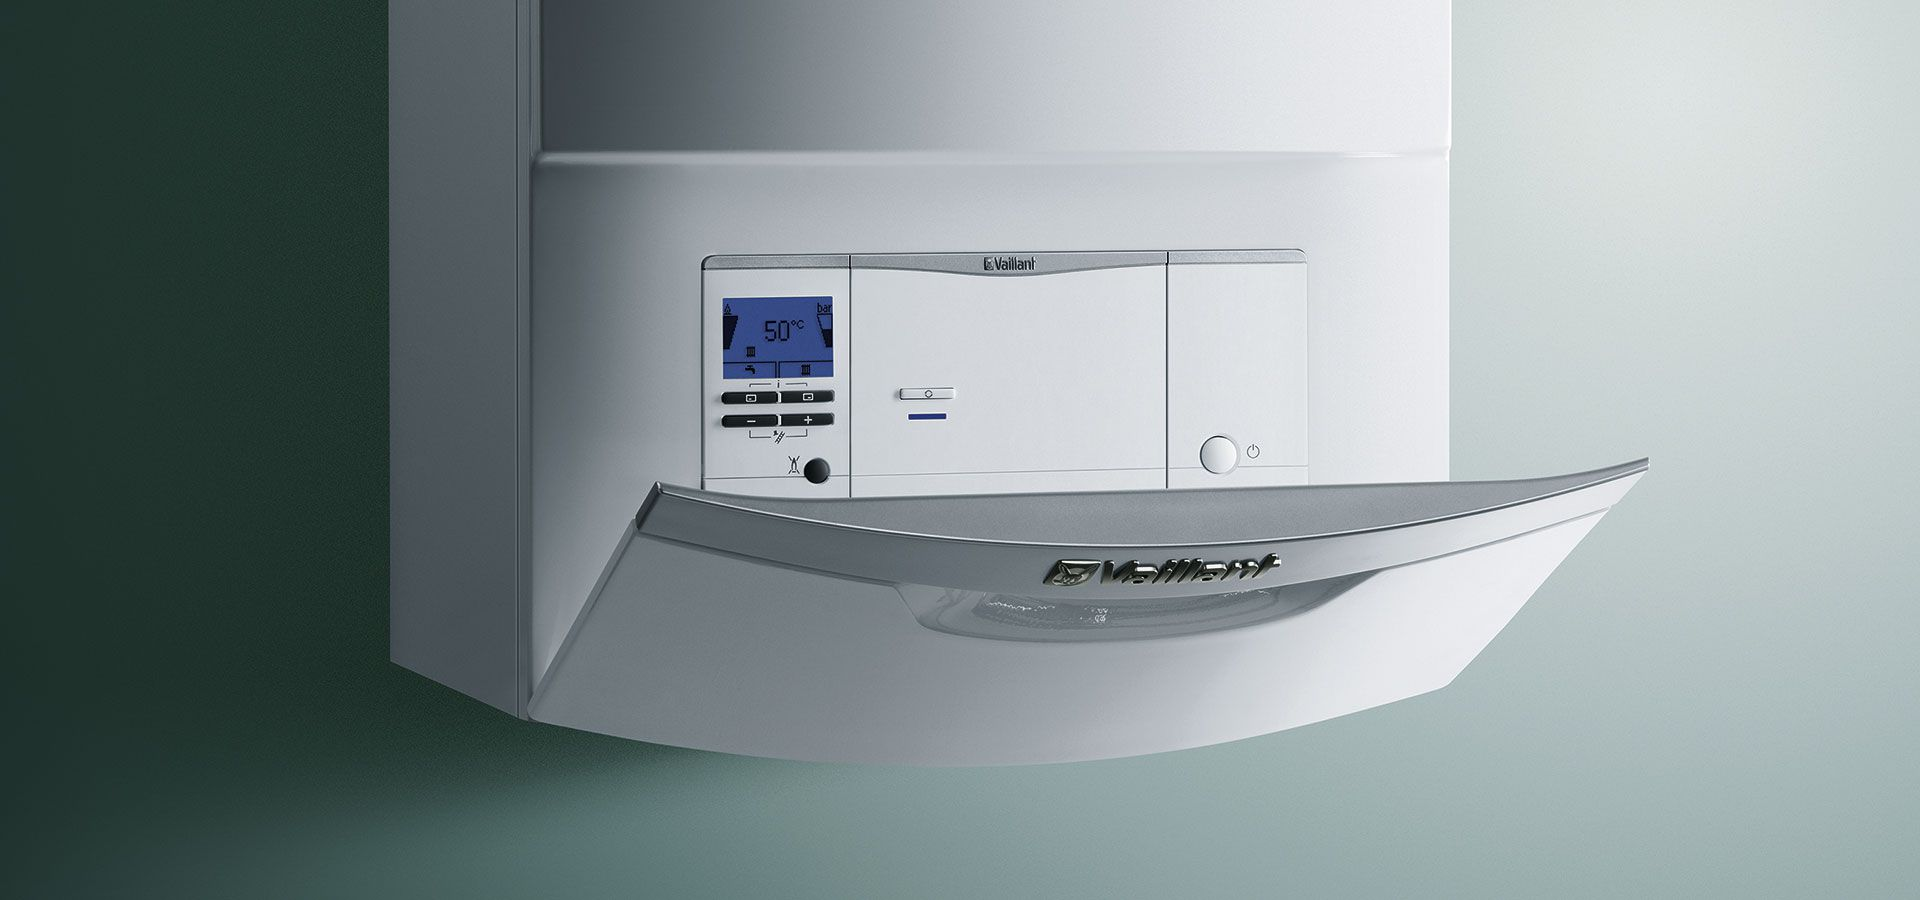 calderas de condensación baratas